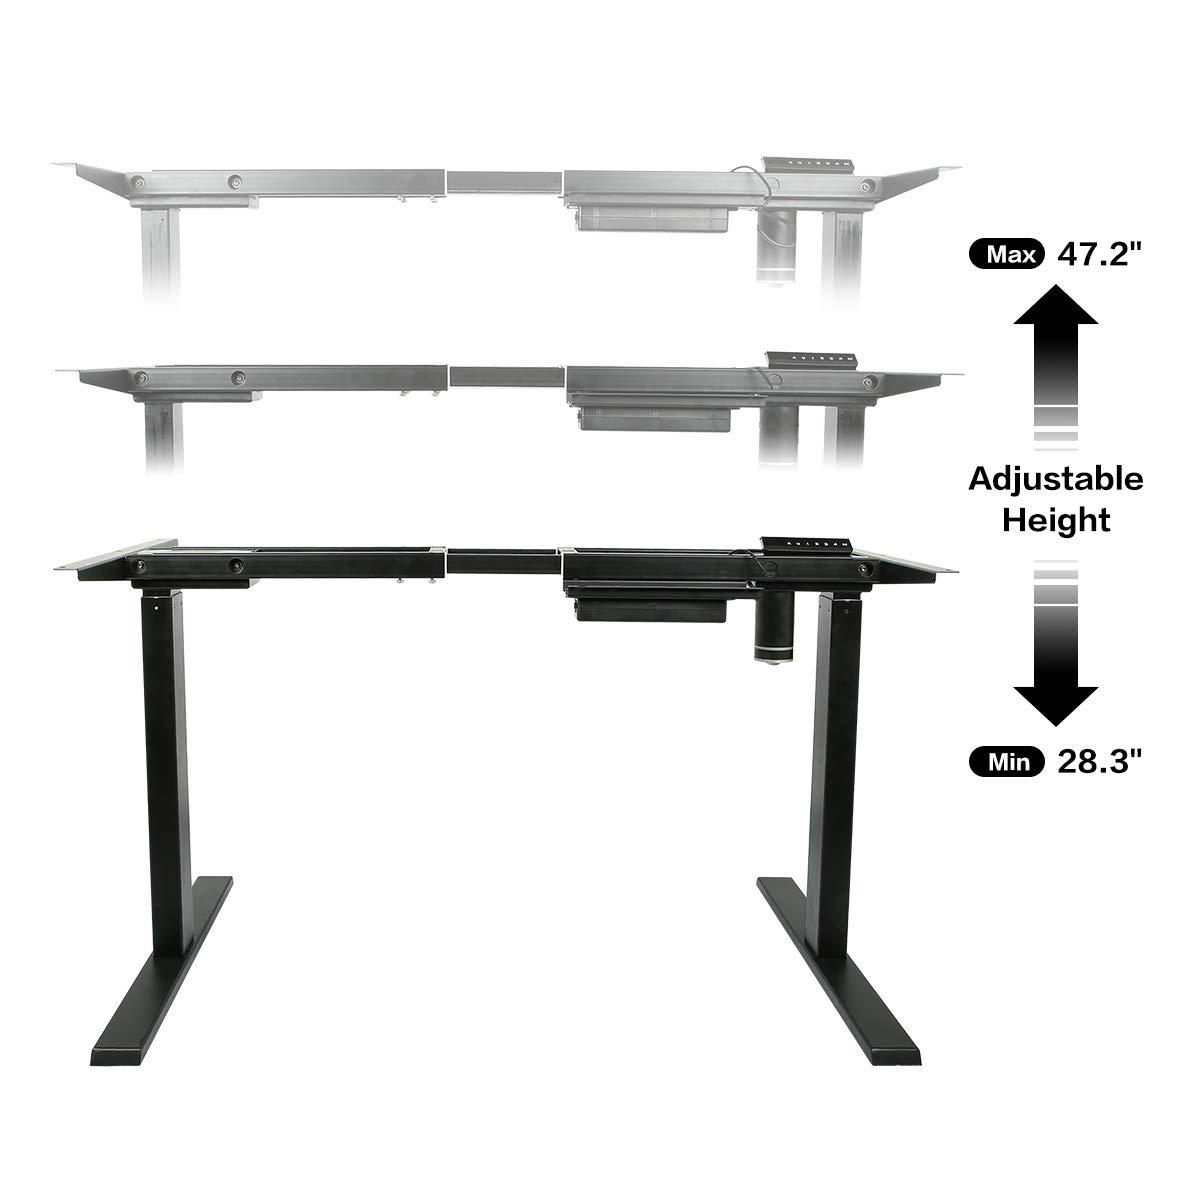 AECOJOY Electric Stand Up Desk Frame, Height Adjustable Standing Base Single Motor DIY Workstation with Memory Controller by AECOJOY